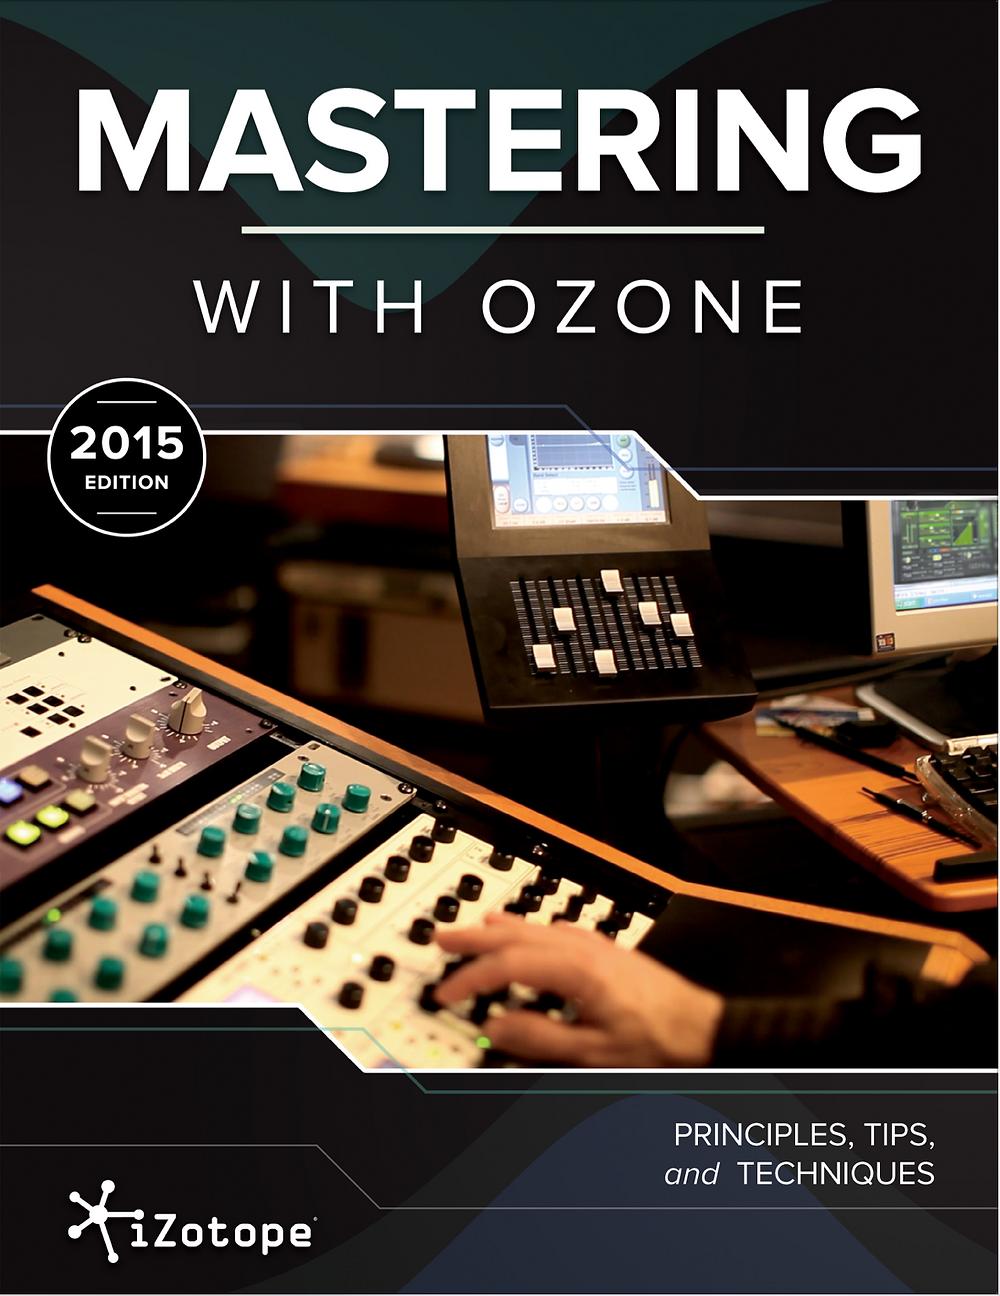 izotope_MasteringGuide_2015.png